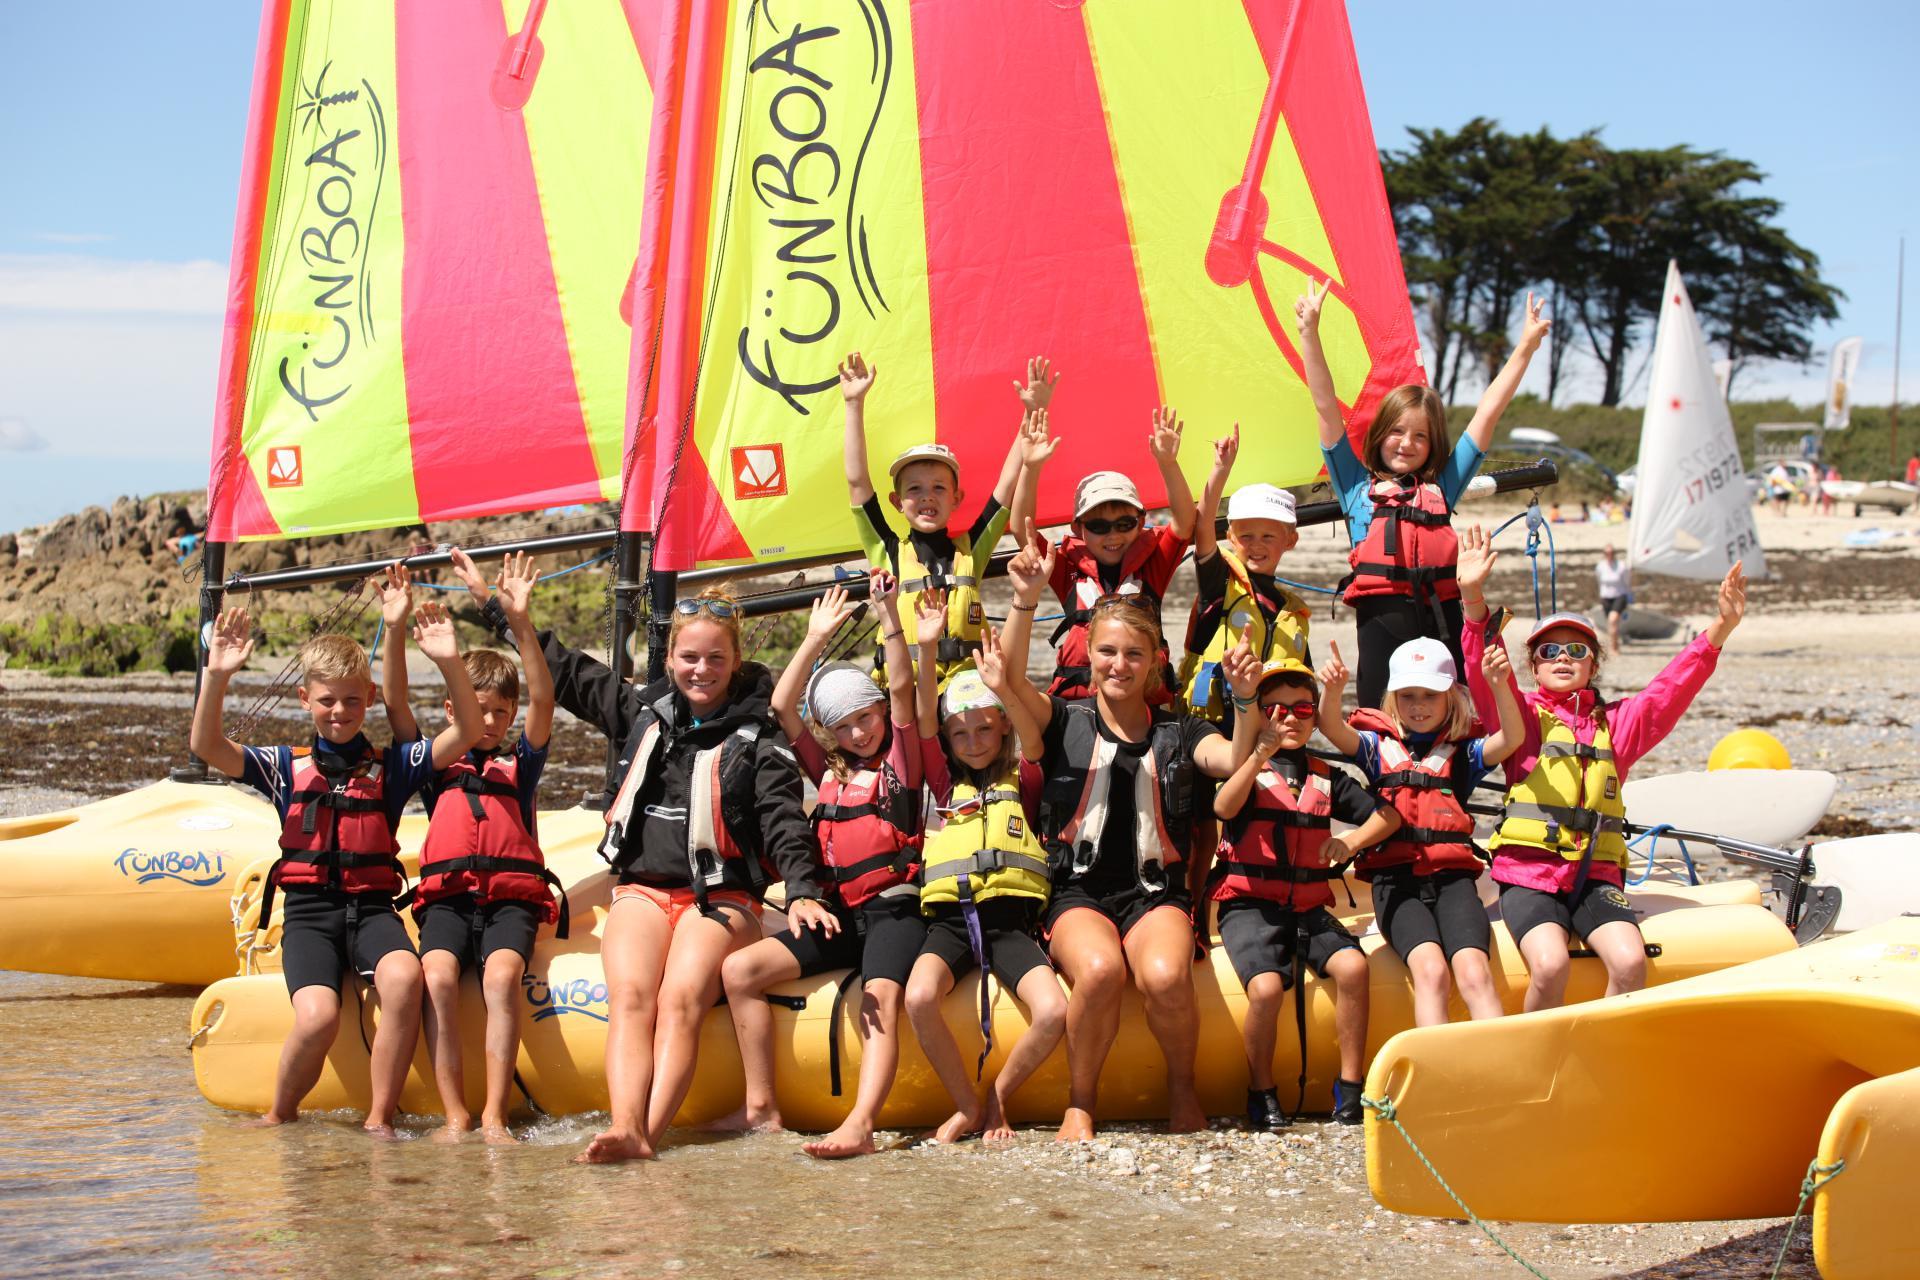 Club Nautique du Rohu - Les Funboat